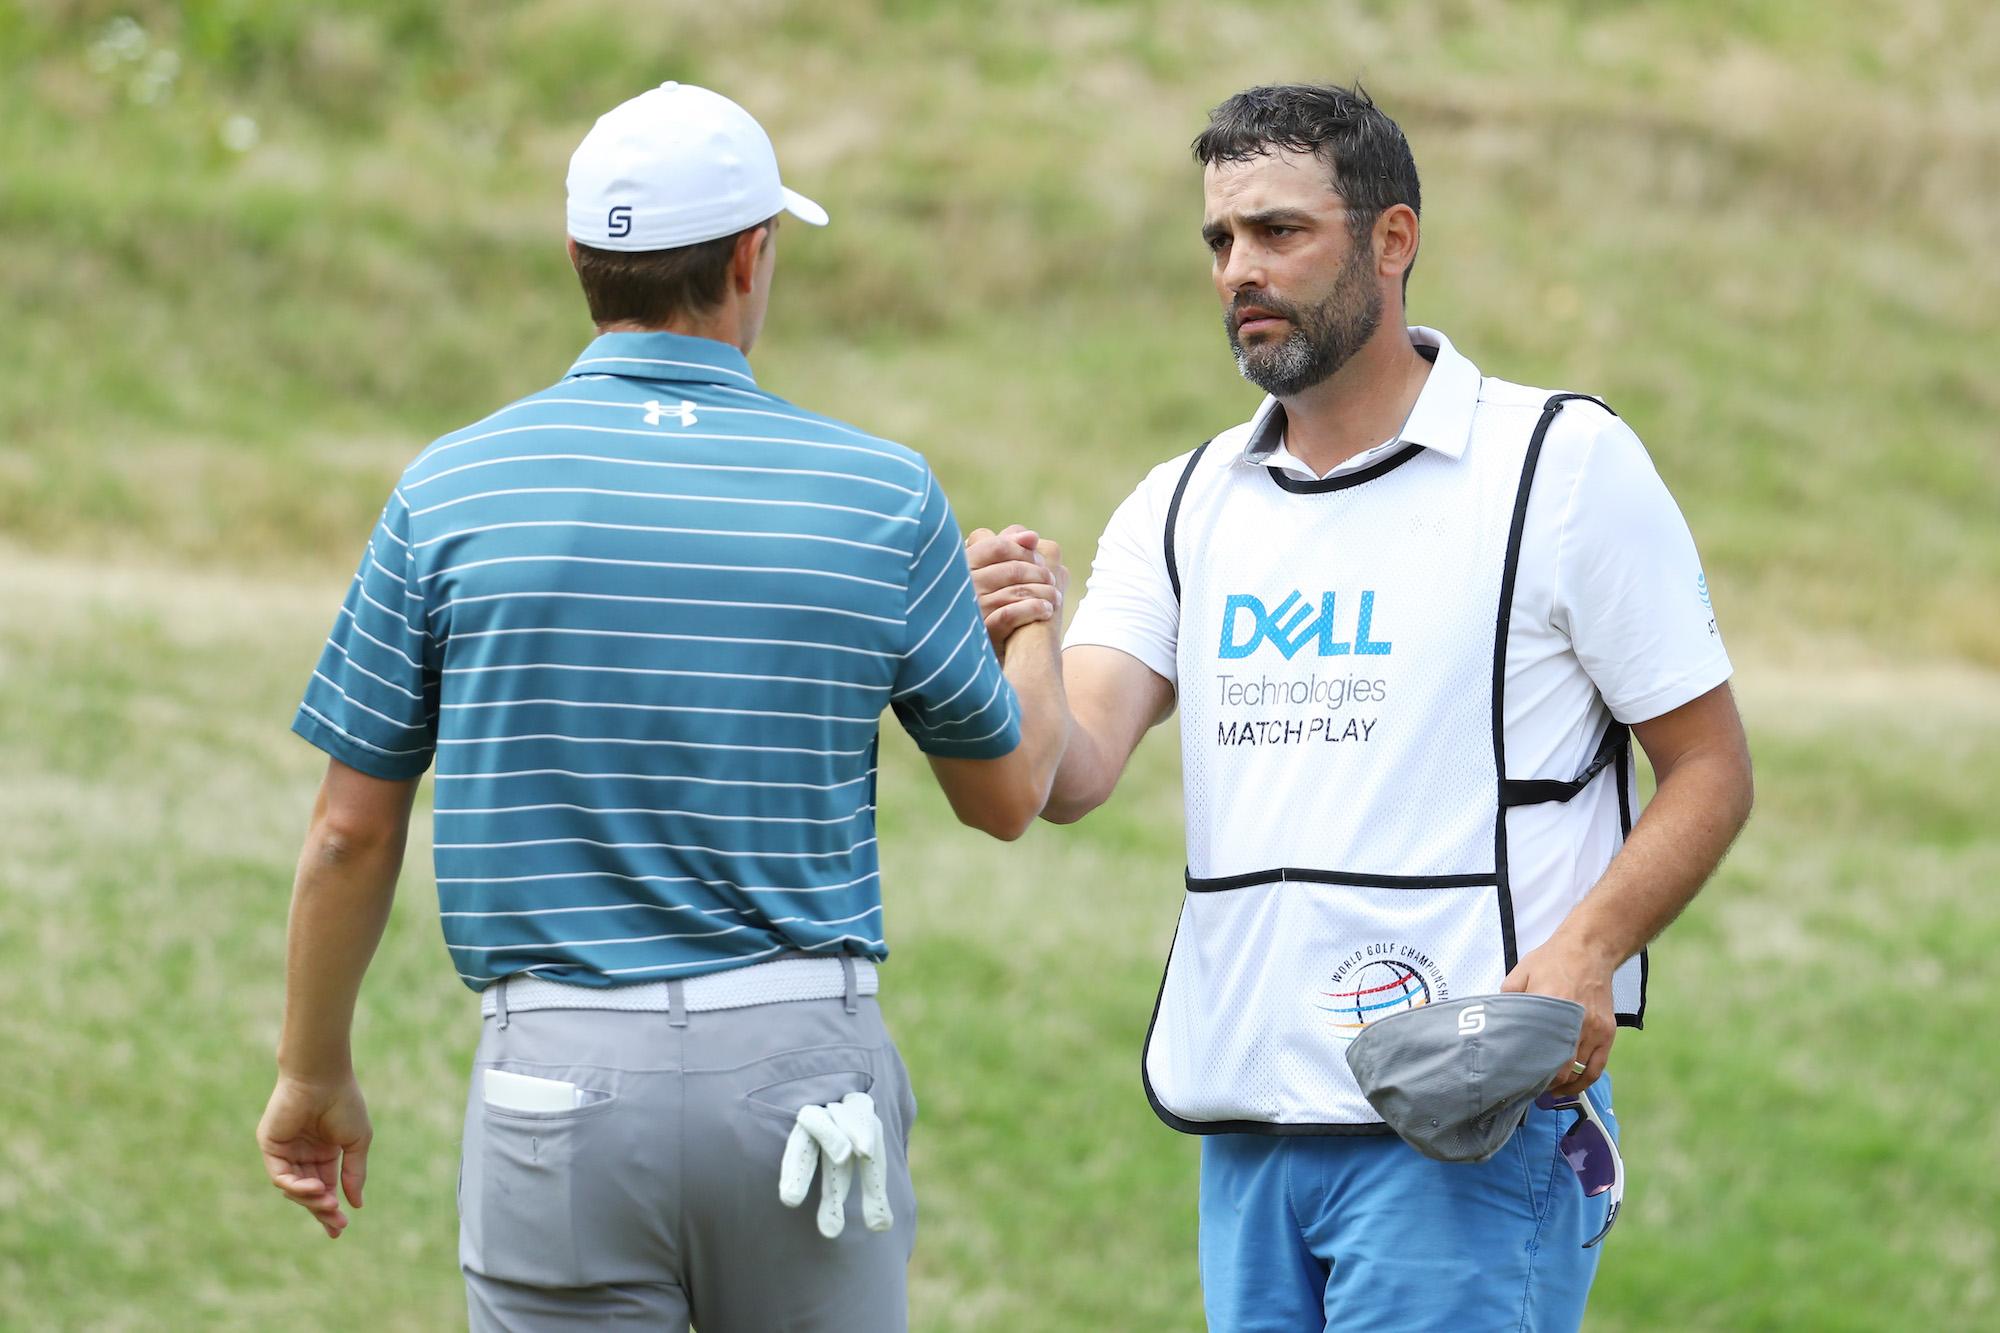 2019 WGC-Dell Technologies Match Play: Round 2 - Jordan and Michael Celebr